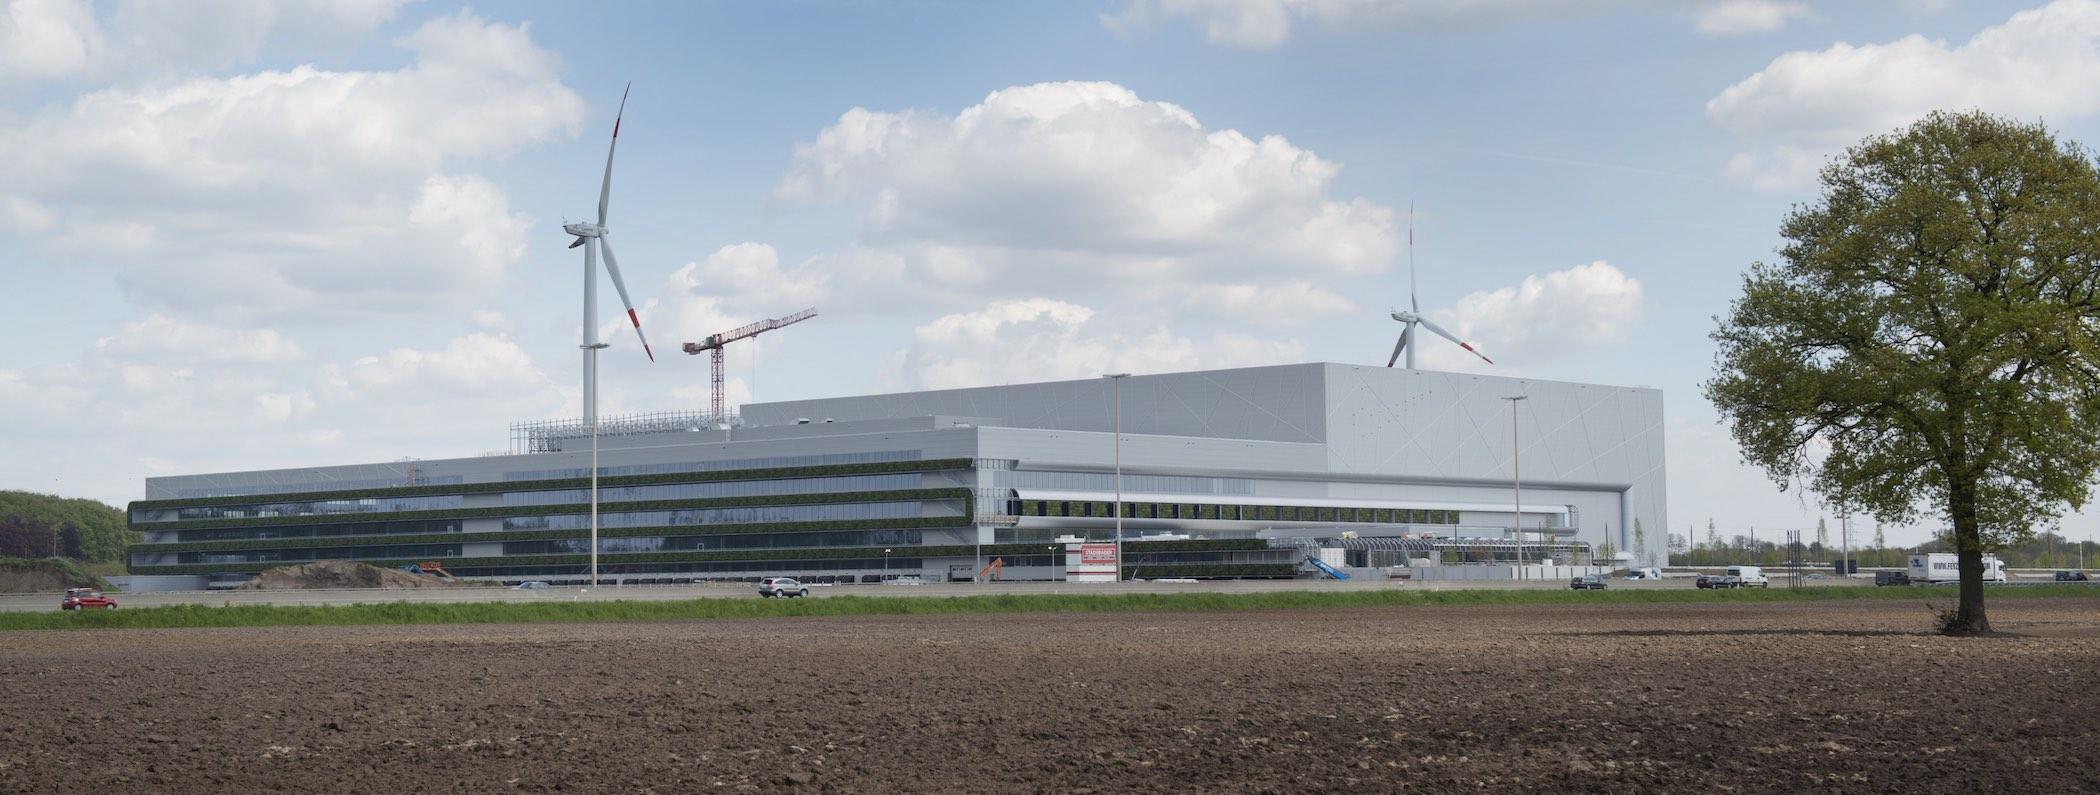 Exterior Living Wall on Nike's European Logistics Campus in Laakdal, Belgium